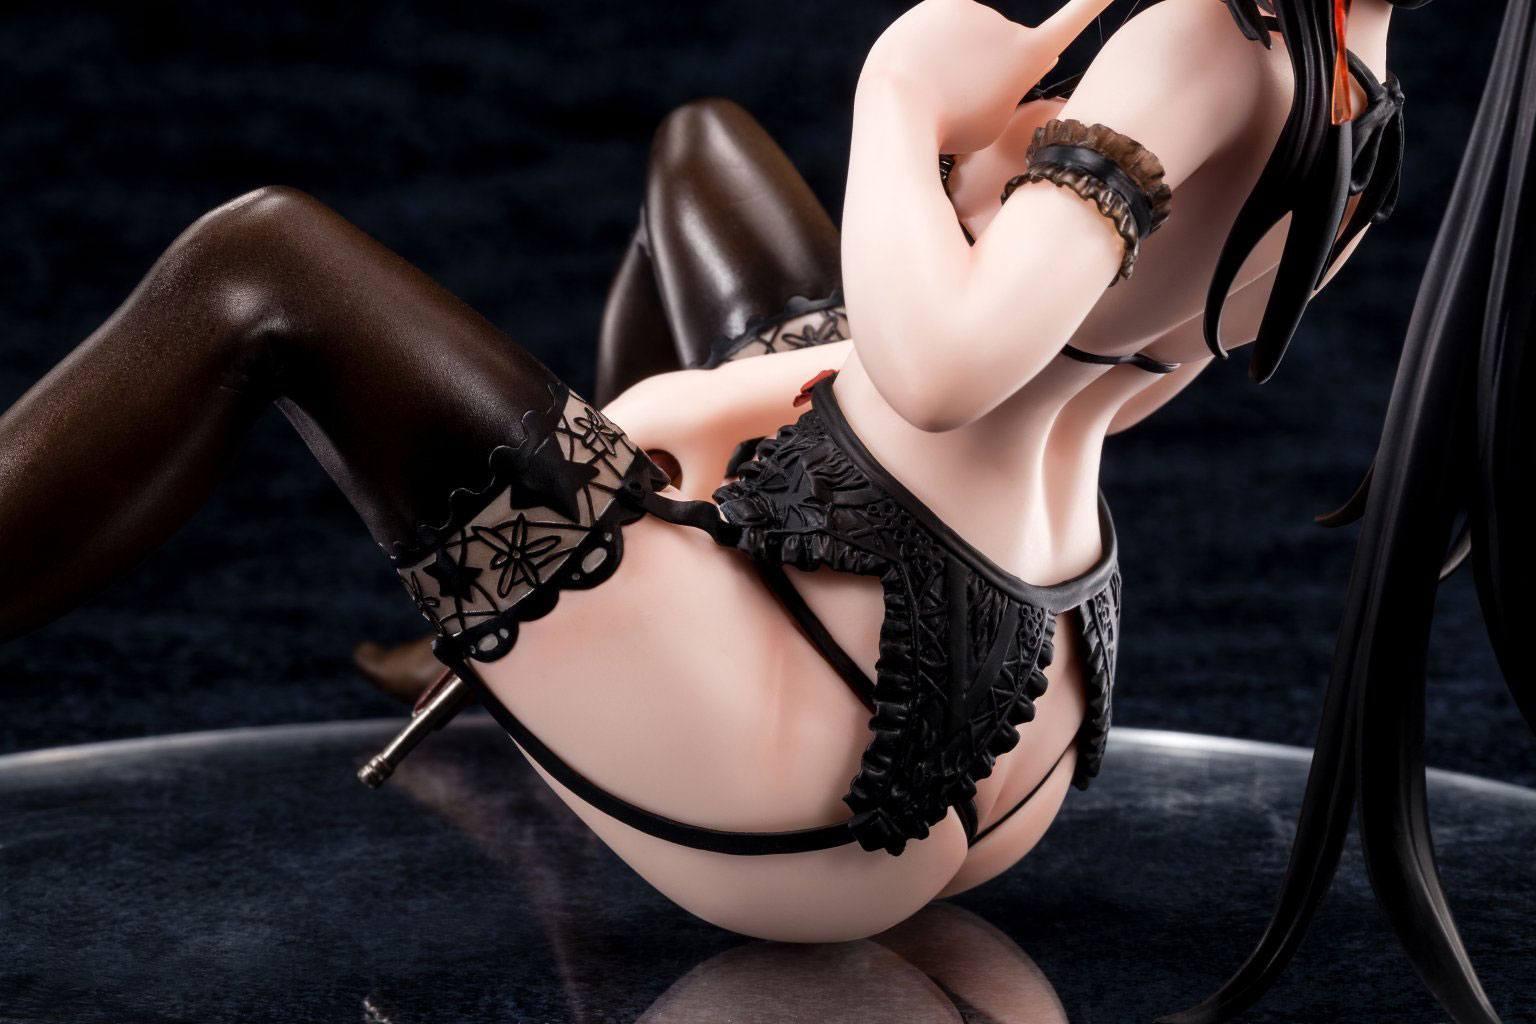 Date a live statuette tokisaki kurumi zafukyel tamer s relaxation 22 cm 4